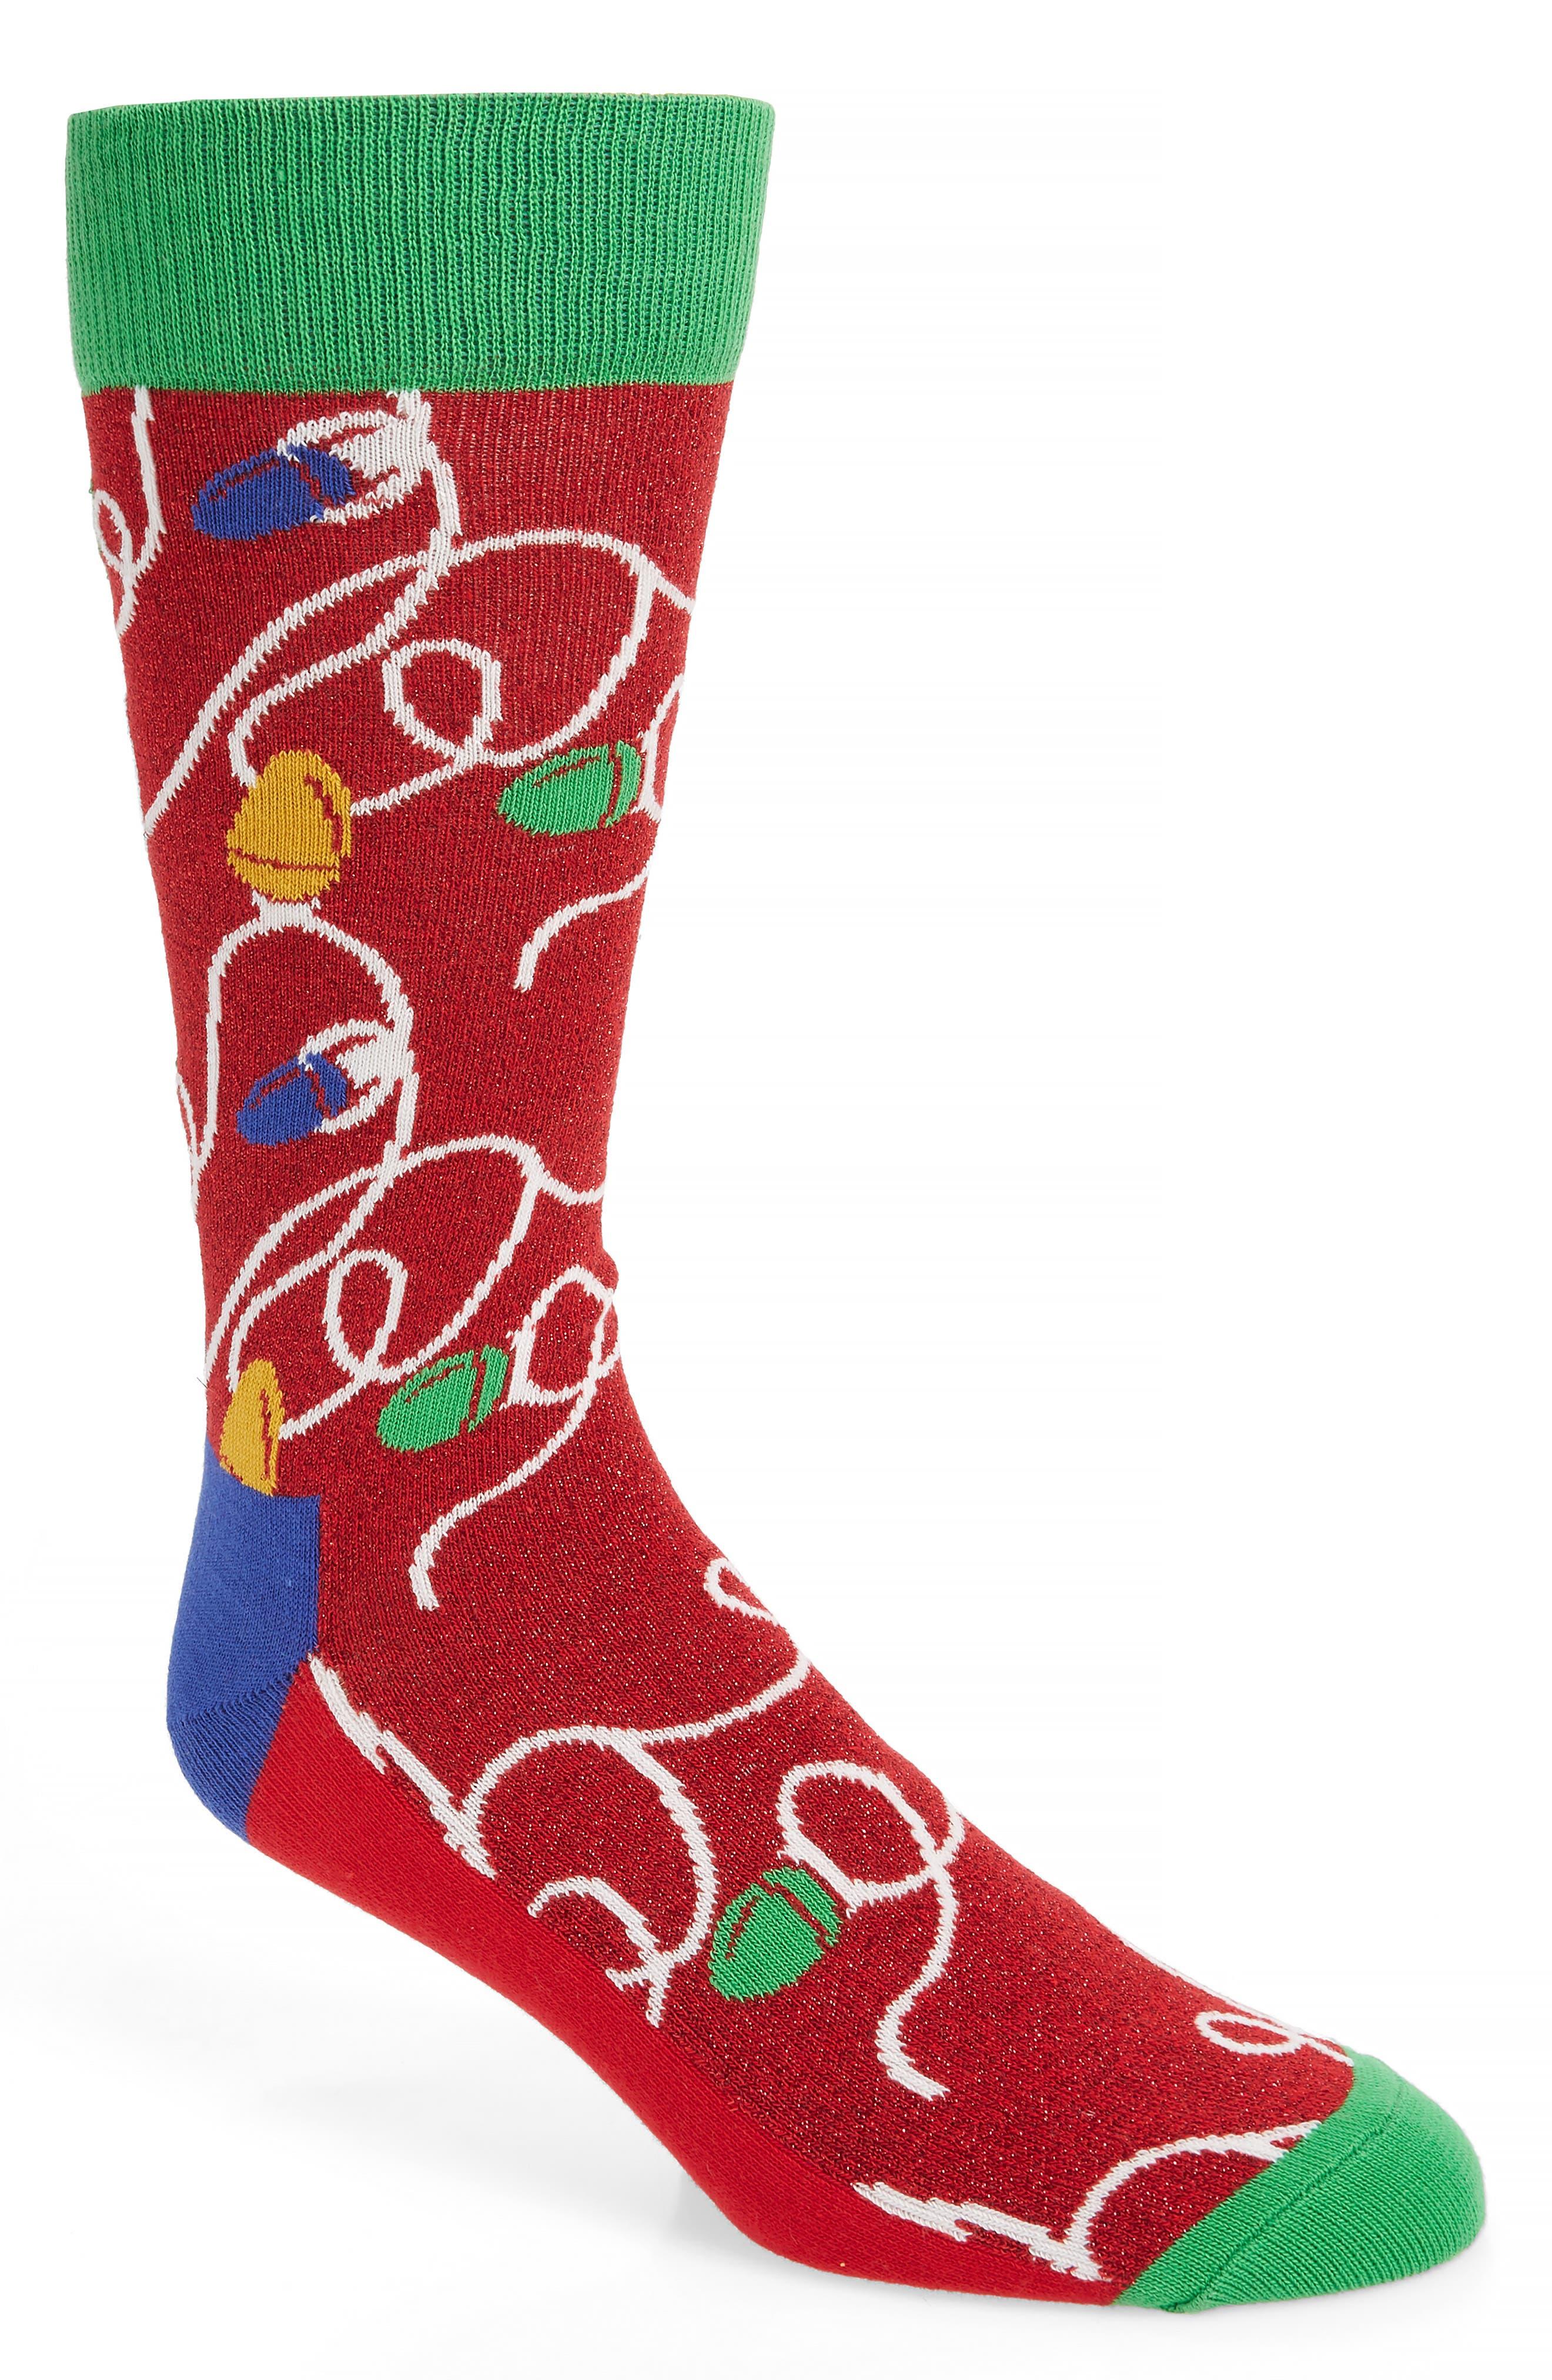 HAPPY SOCKS Holiday Lights Socks in Red